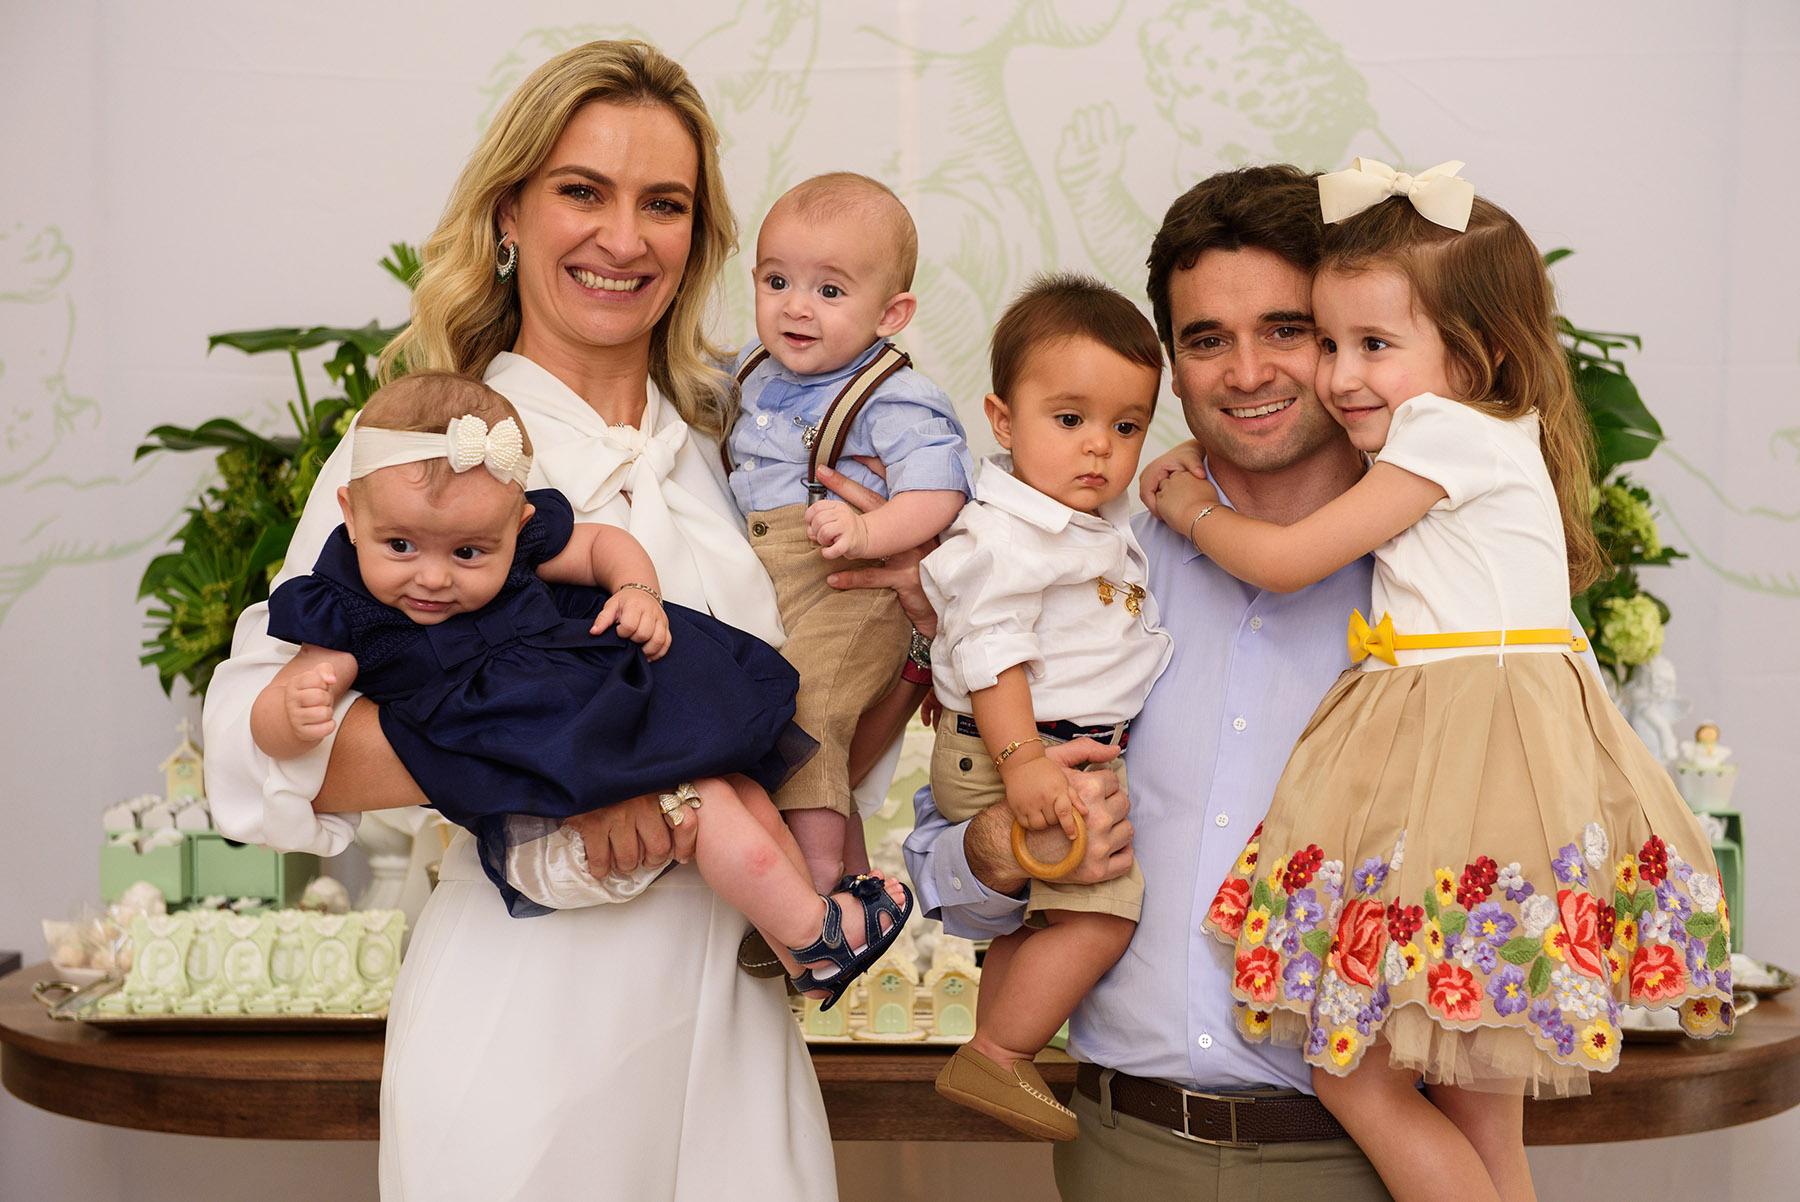 20_batizado_curitiba_fotografia_infantil_familias_fotografo_guswanderley.jpg